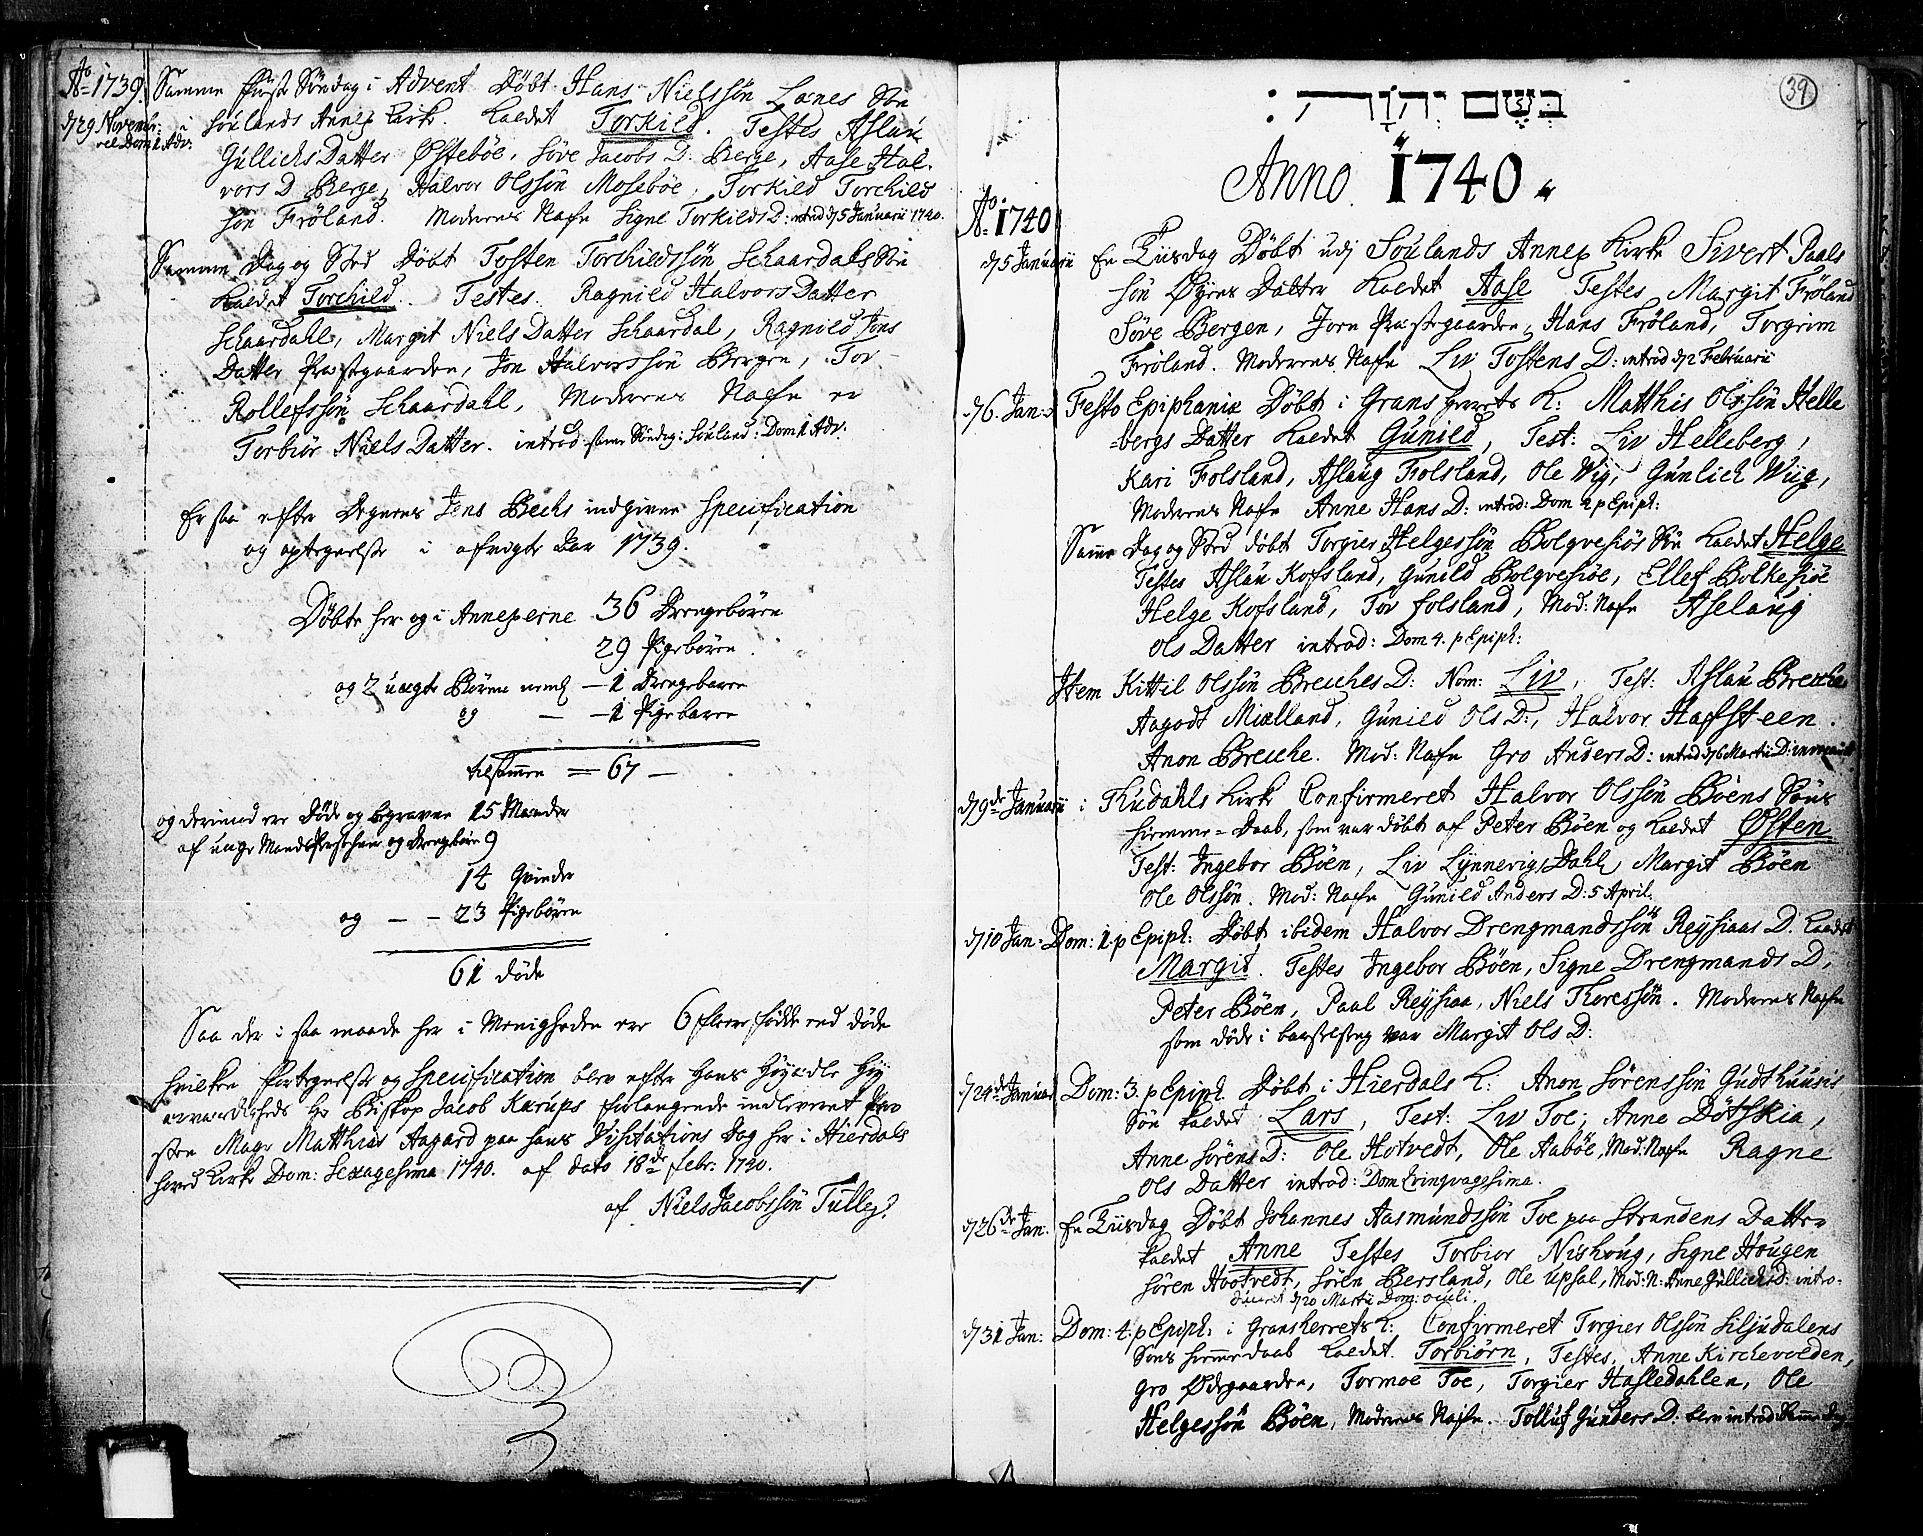 SAKO, Hjartdal kirkebøker, F/Fa/L0003: Ministerialbok nr. I 3, 1727-1775, s. 39